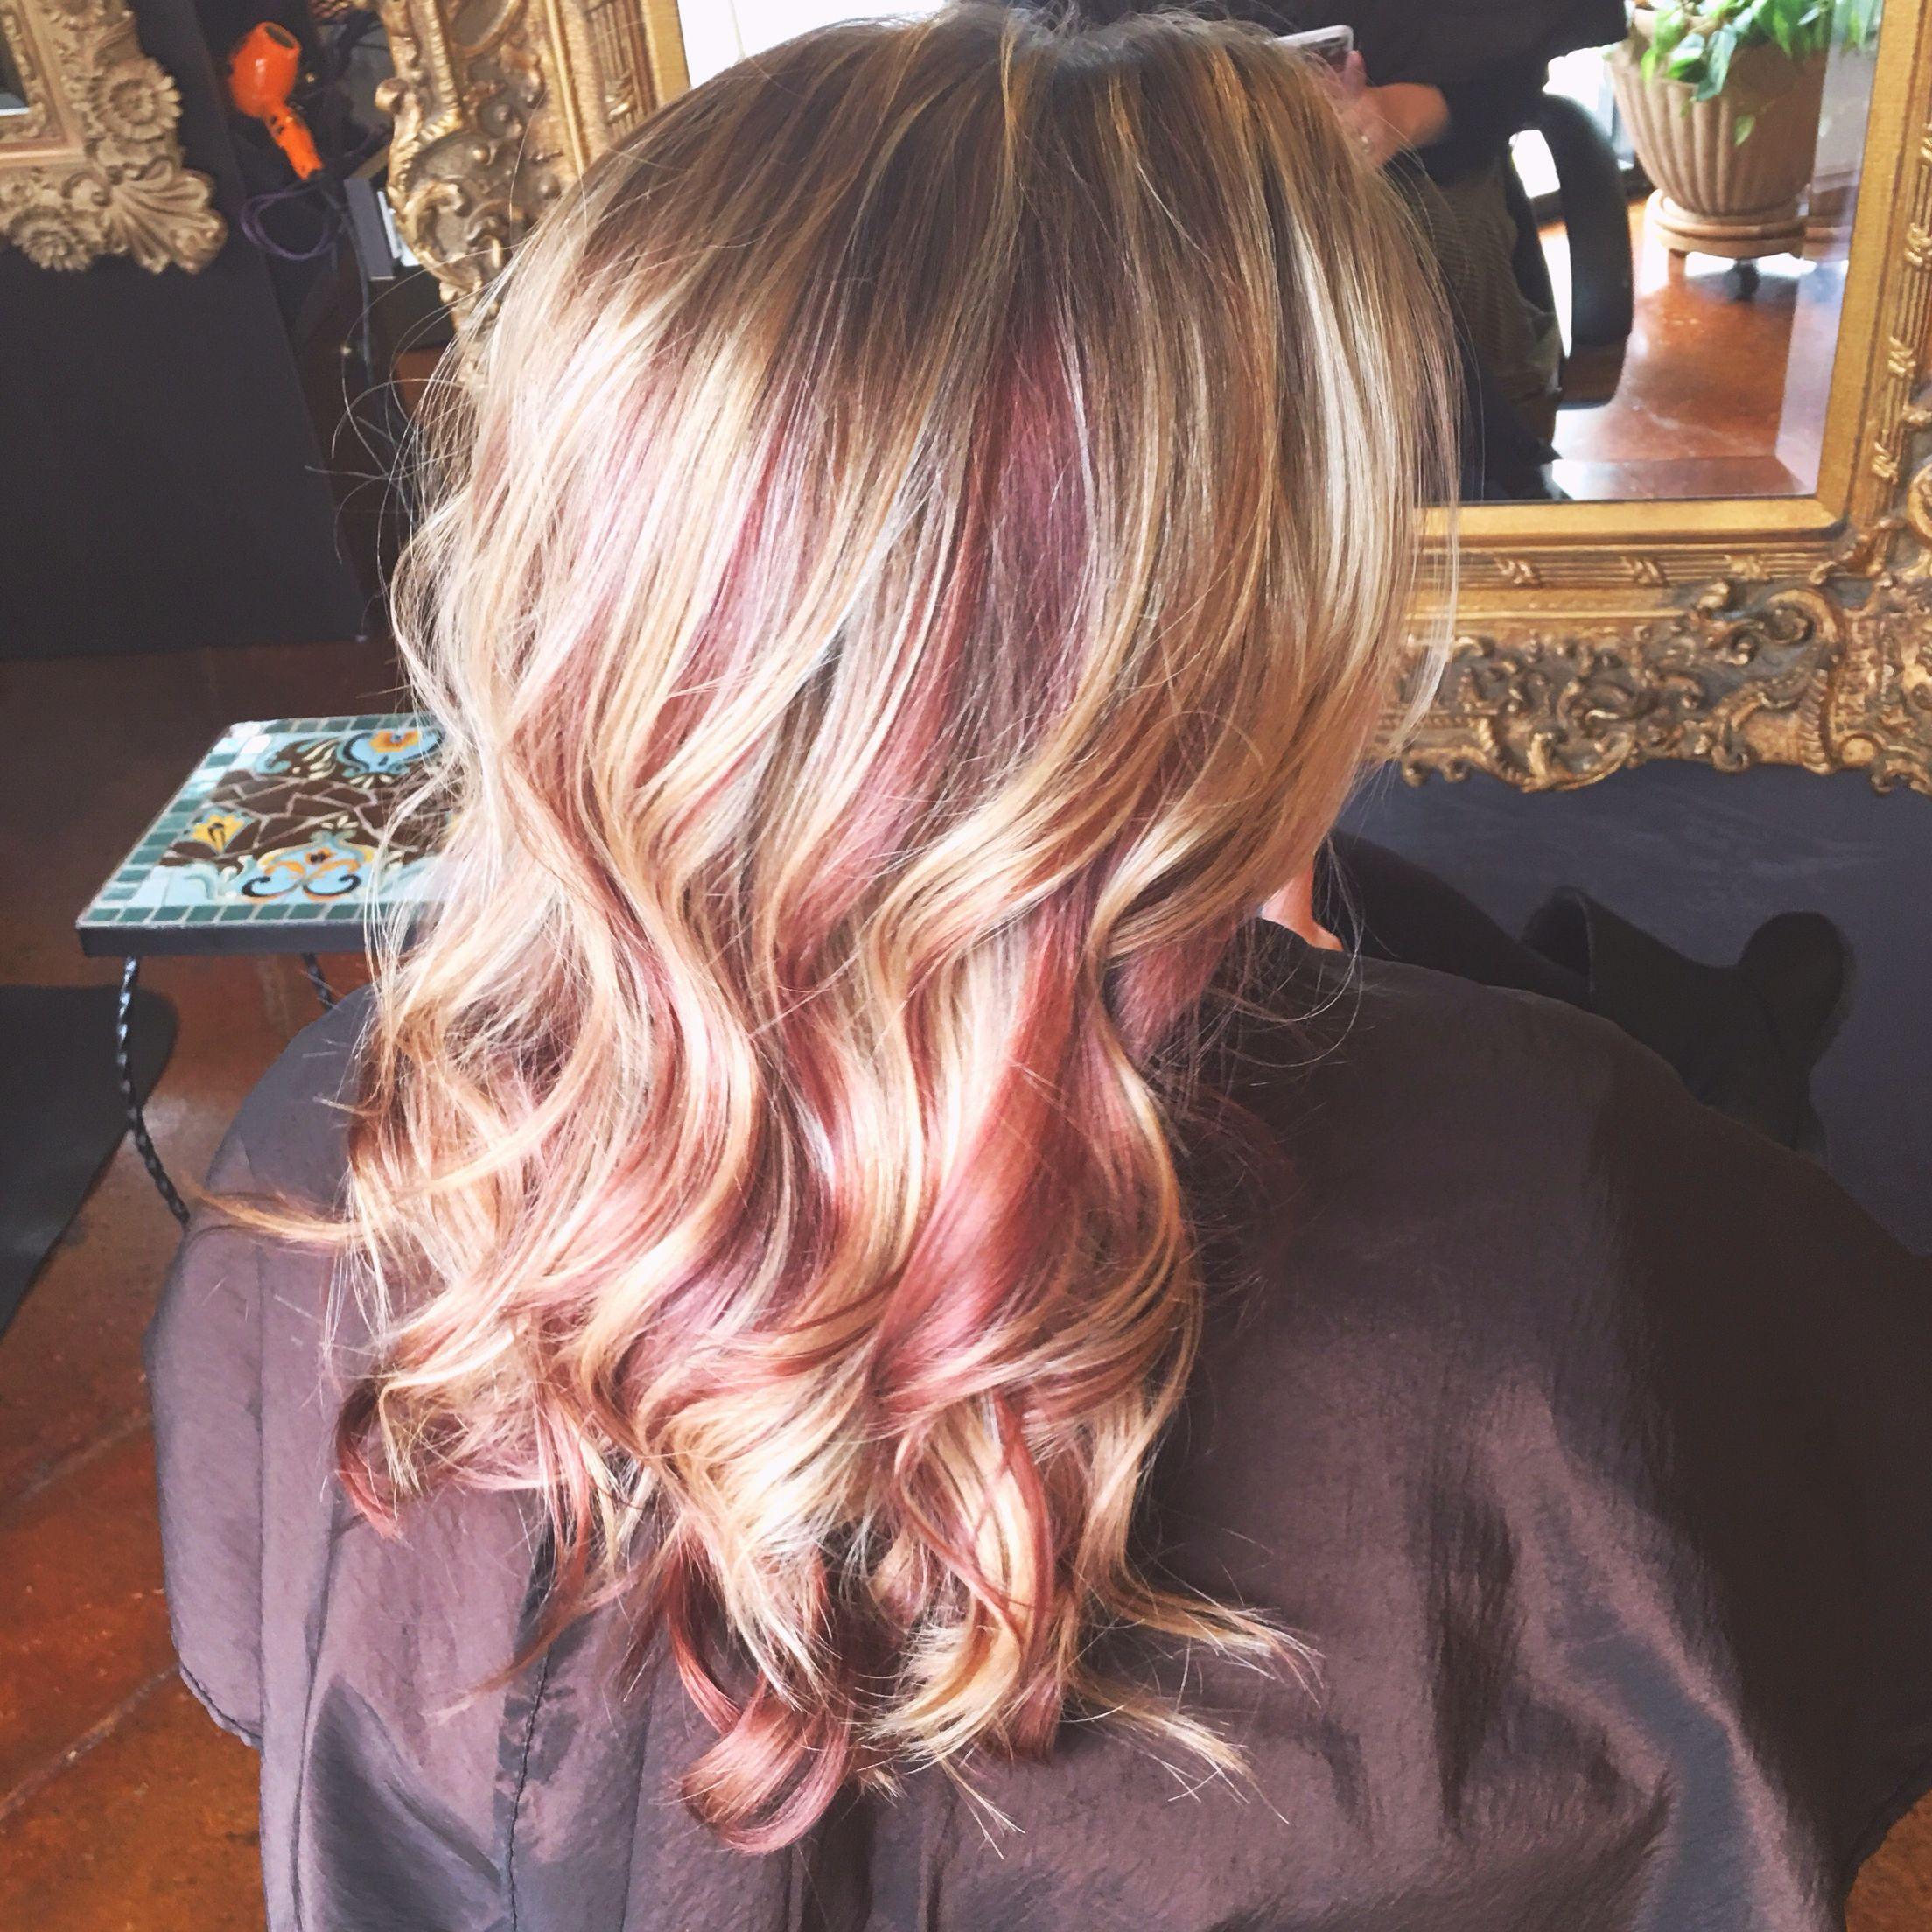 Dusty Rose Gold Peek A Boo Hair Color Hair Color Flamboyage Hair Color Rose Gold Summer Hair Color